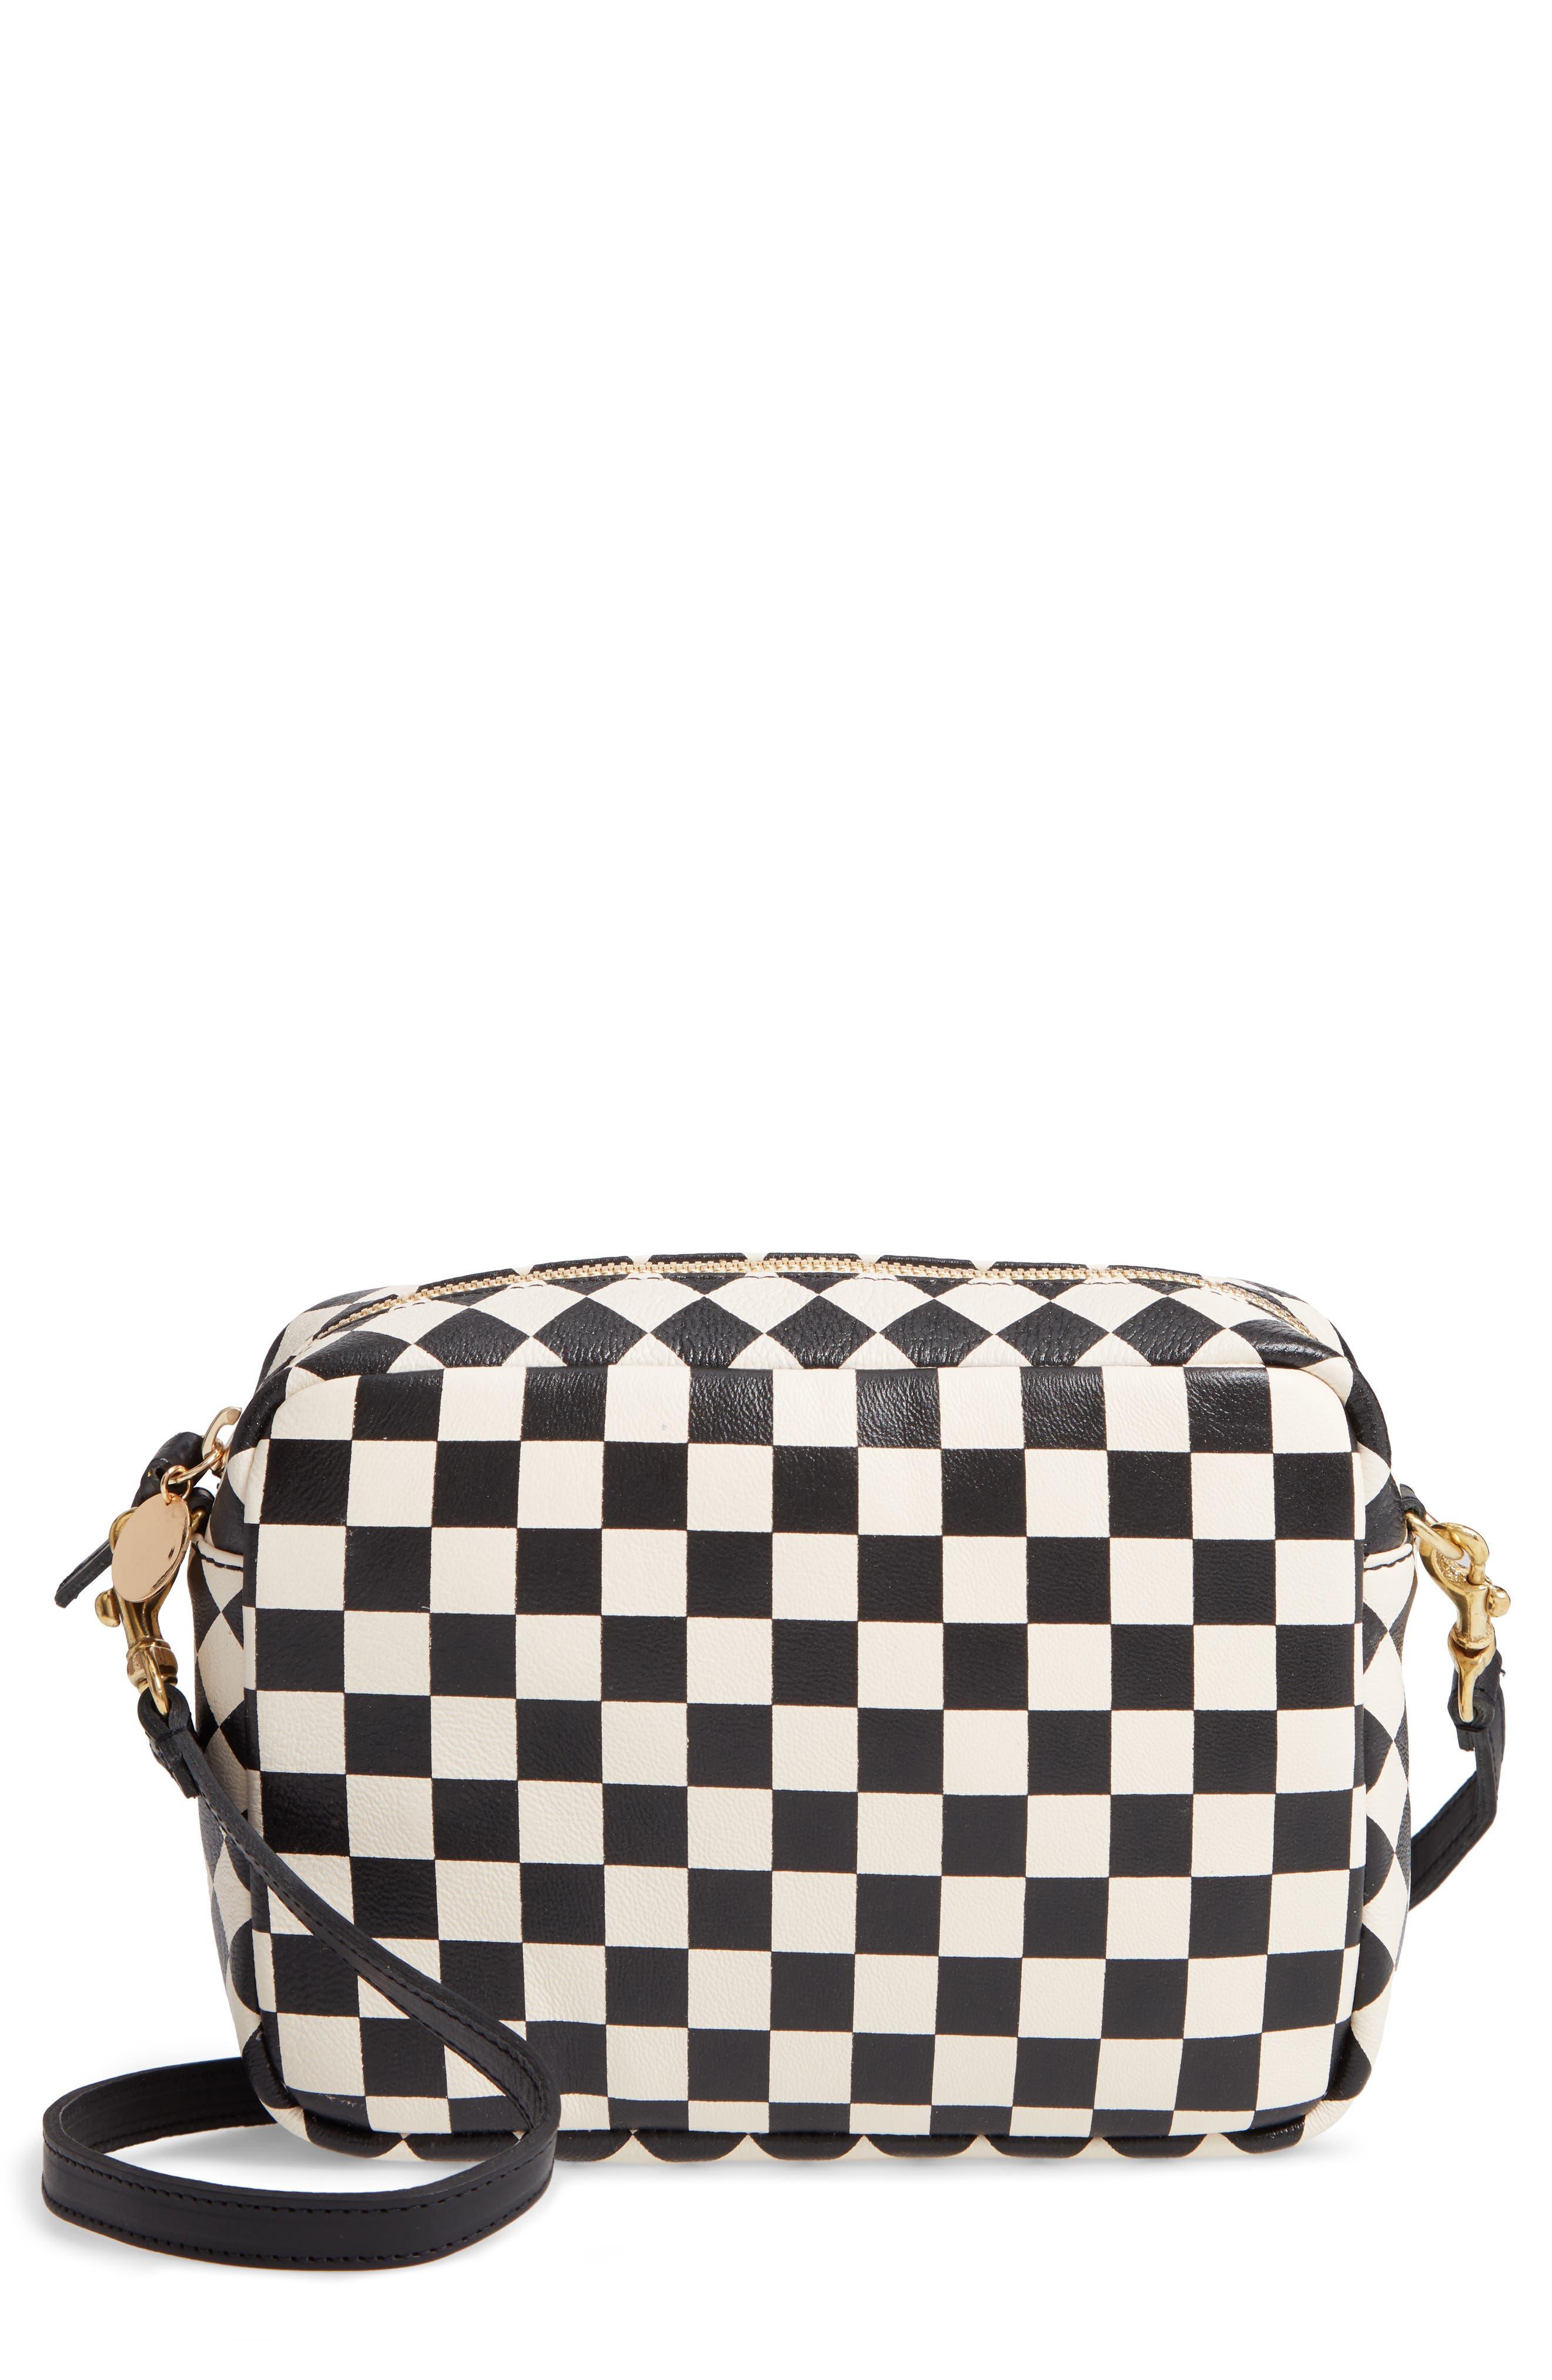 Midi Sac Check Leather Shoulder Bag,                             Main thumbnail 1, color,                             CREAM/ BLACK CHECKERS